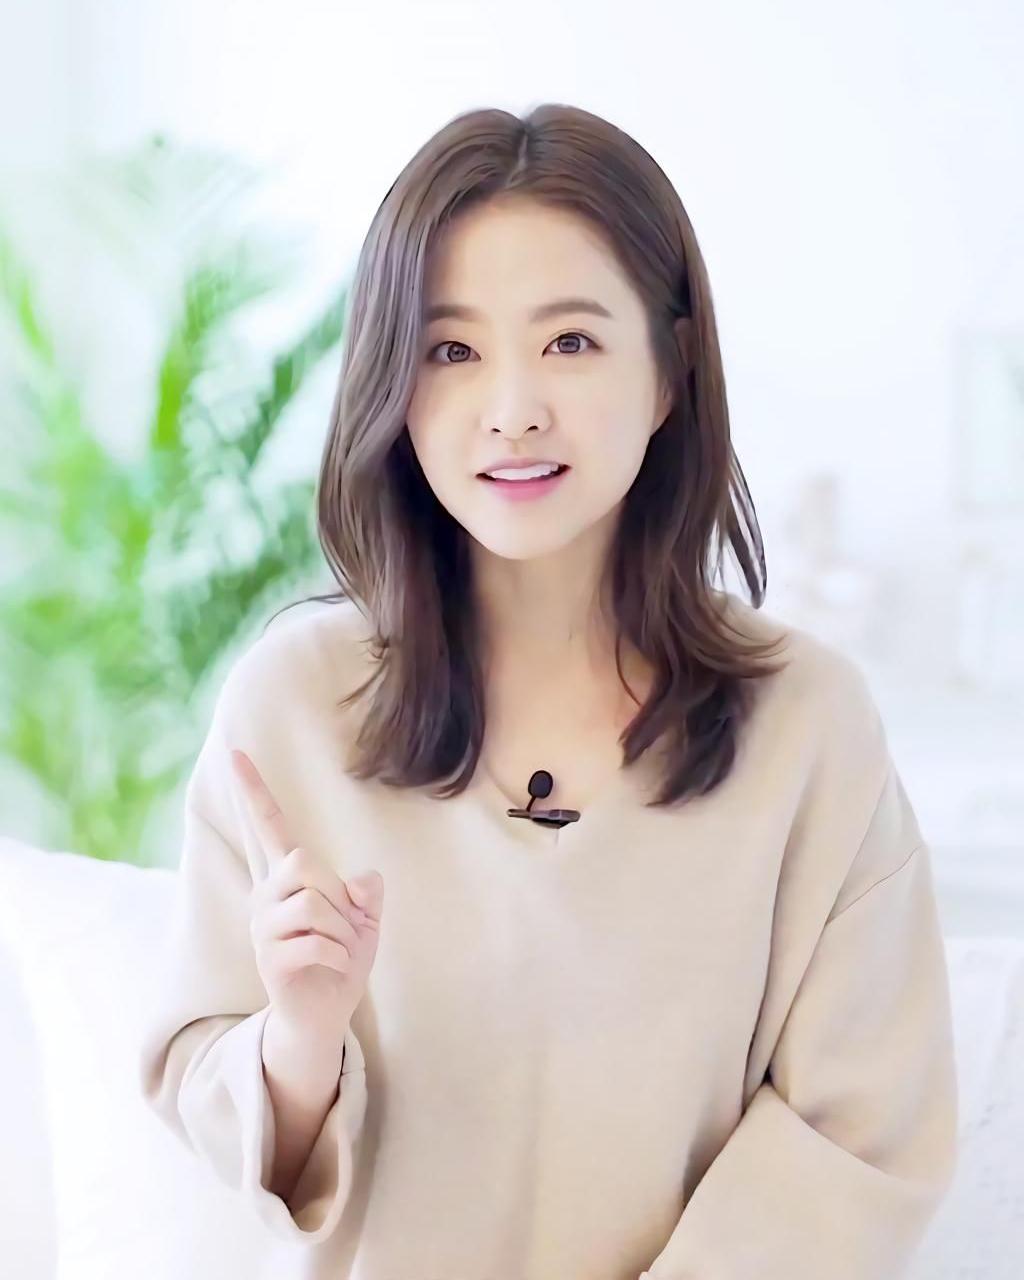 Park Shin-Hye artis korea selatan seksi tanpa oplas